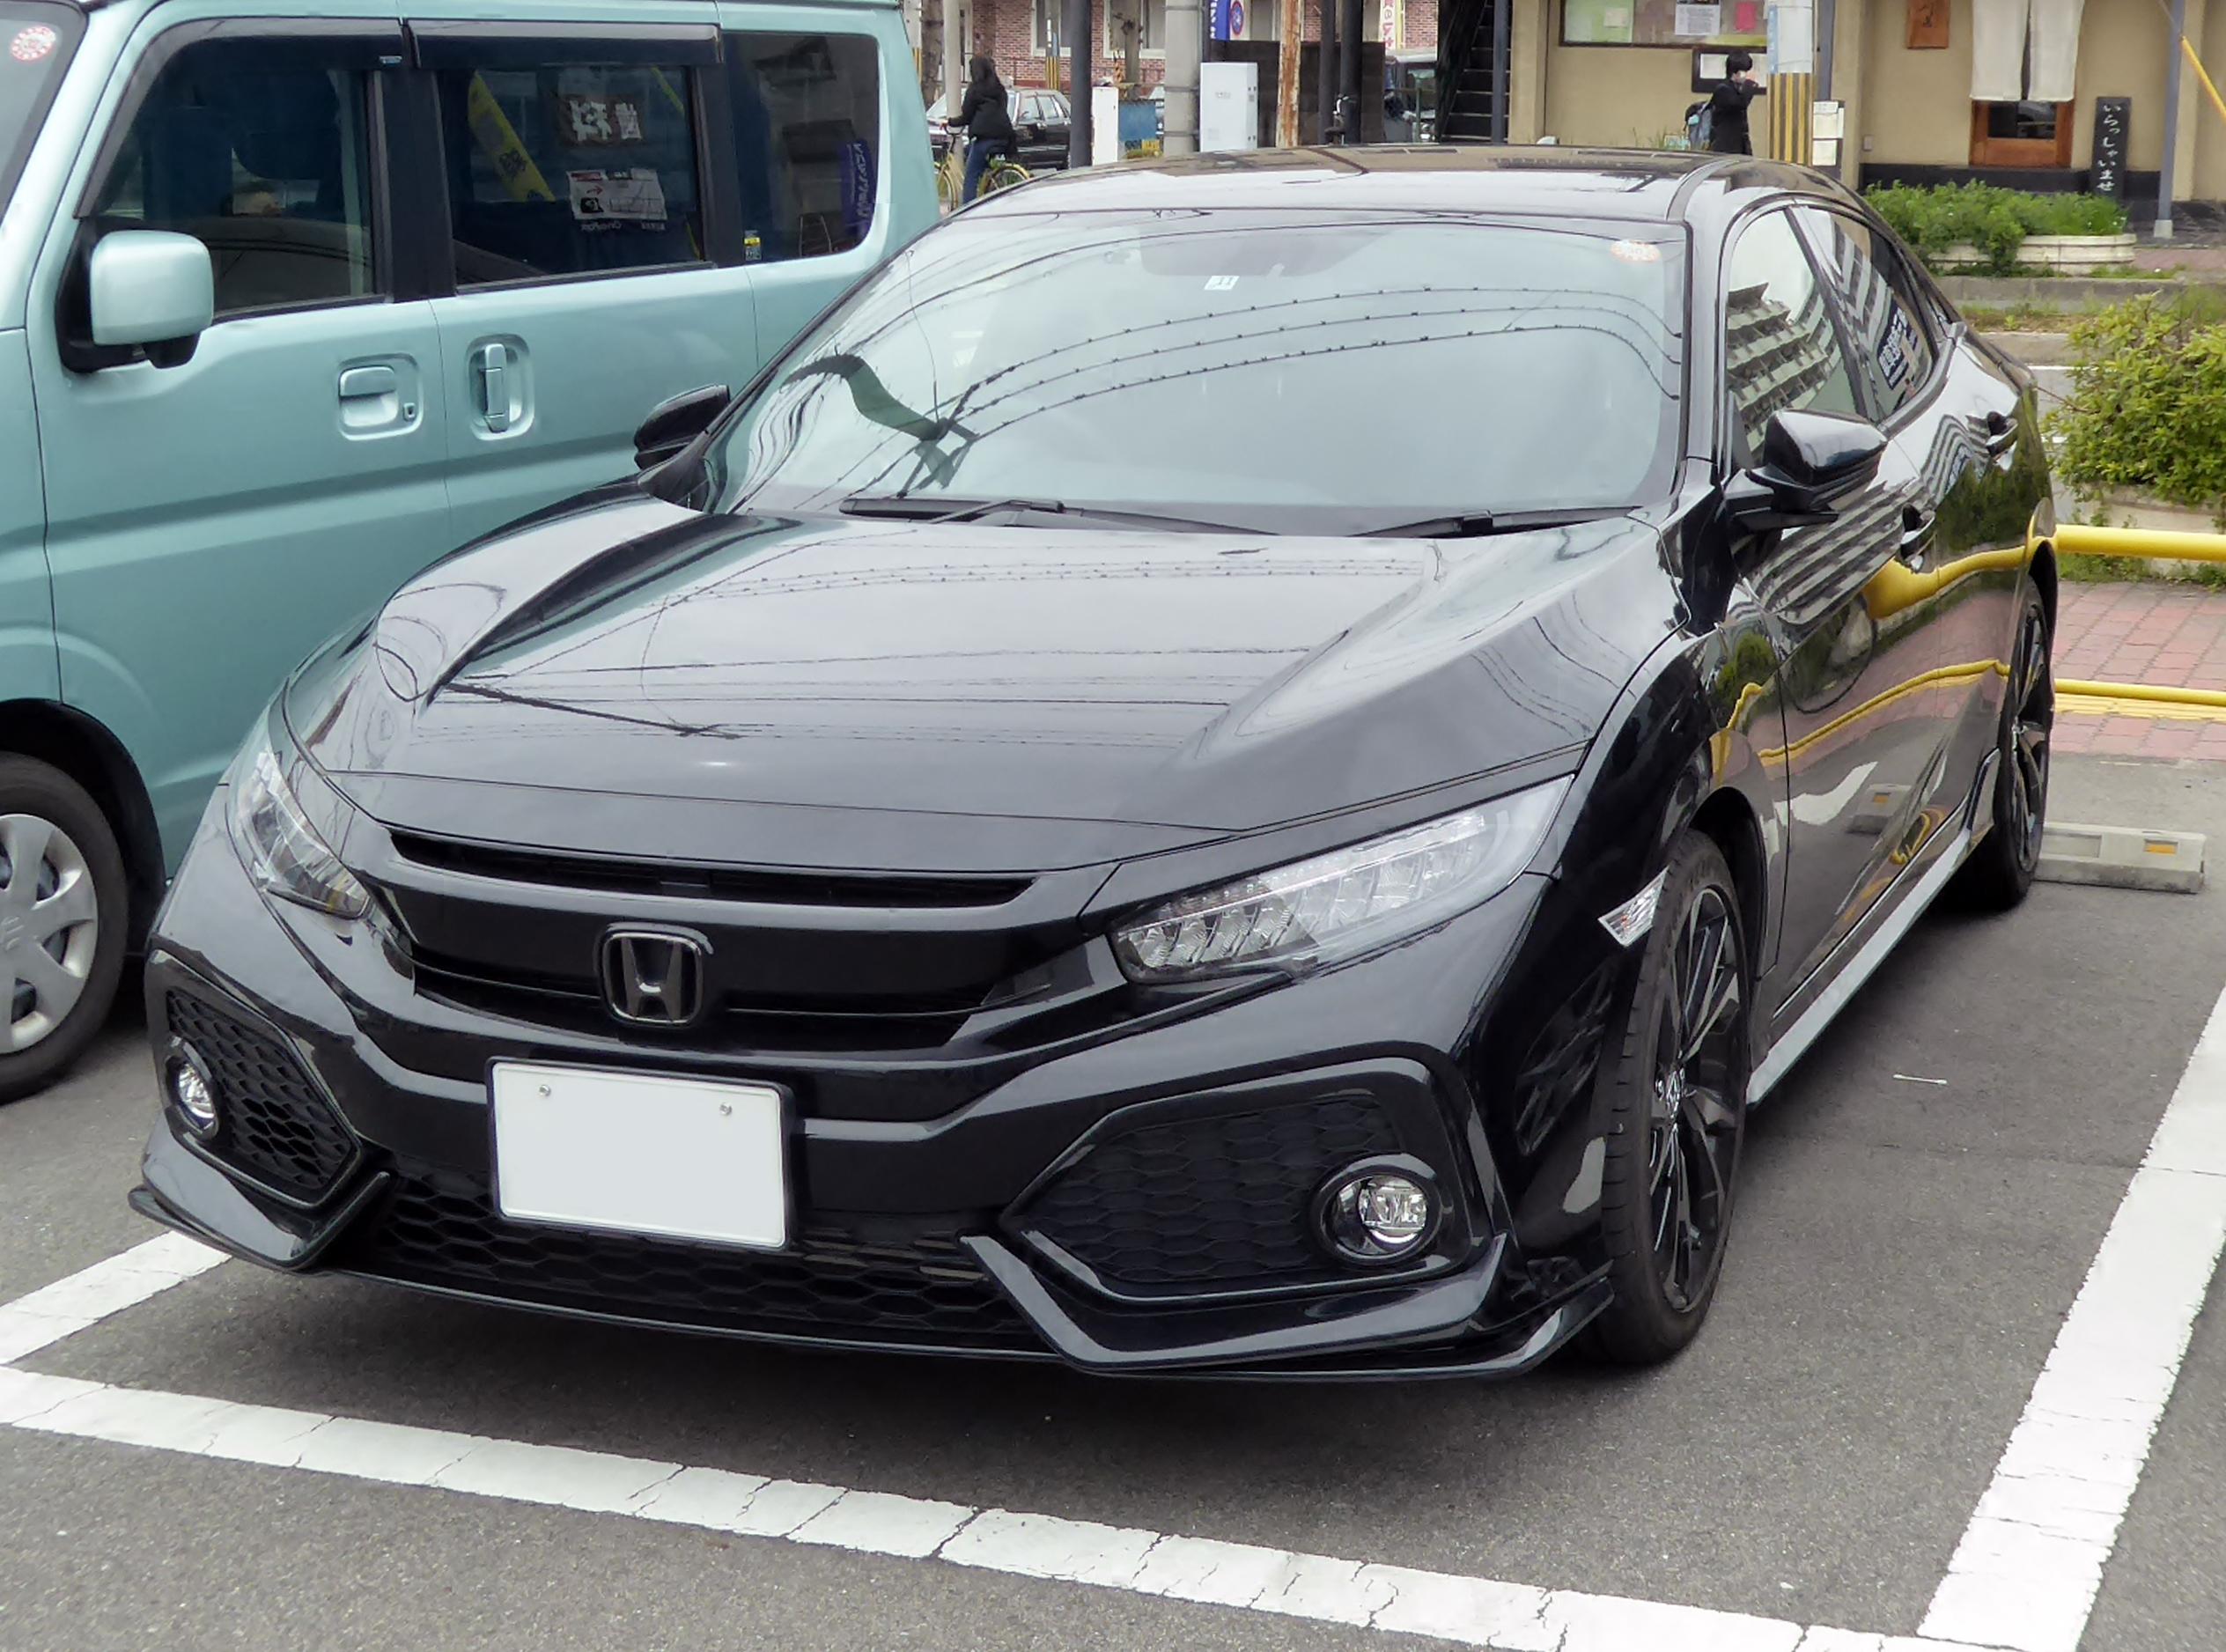 Kelebihan Civic Fk7 Spesifikasi